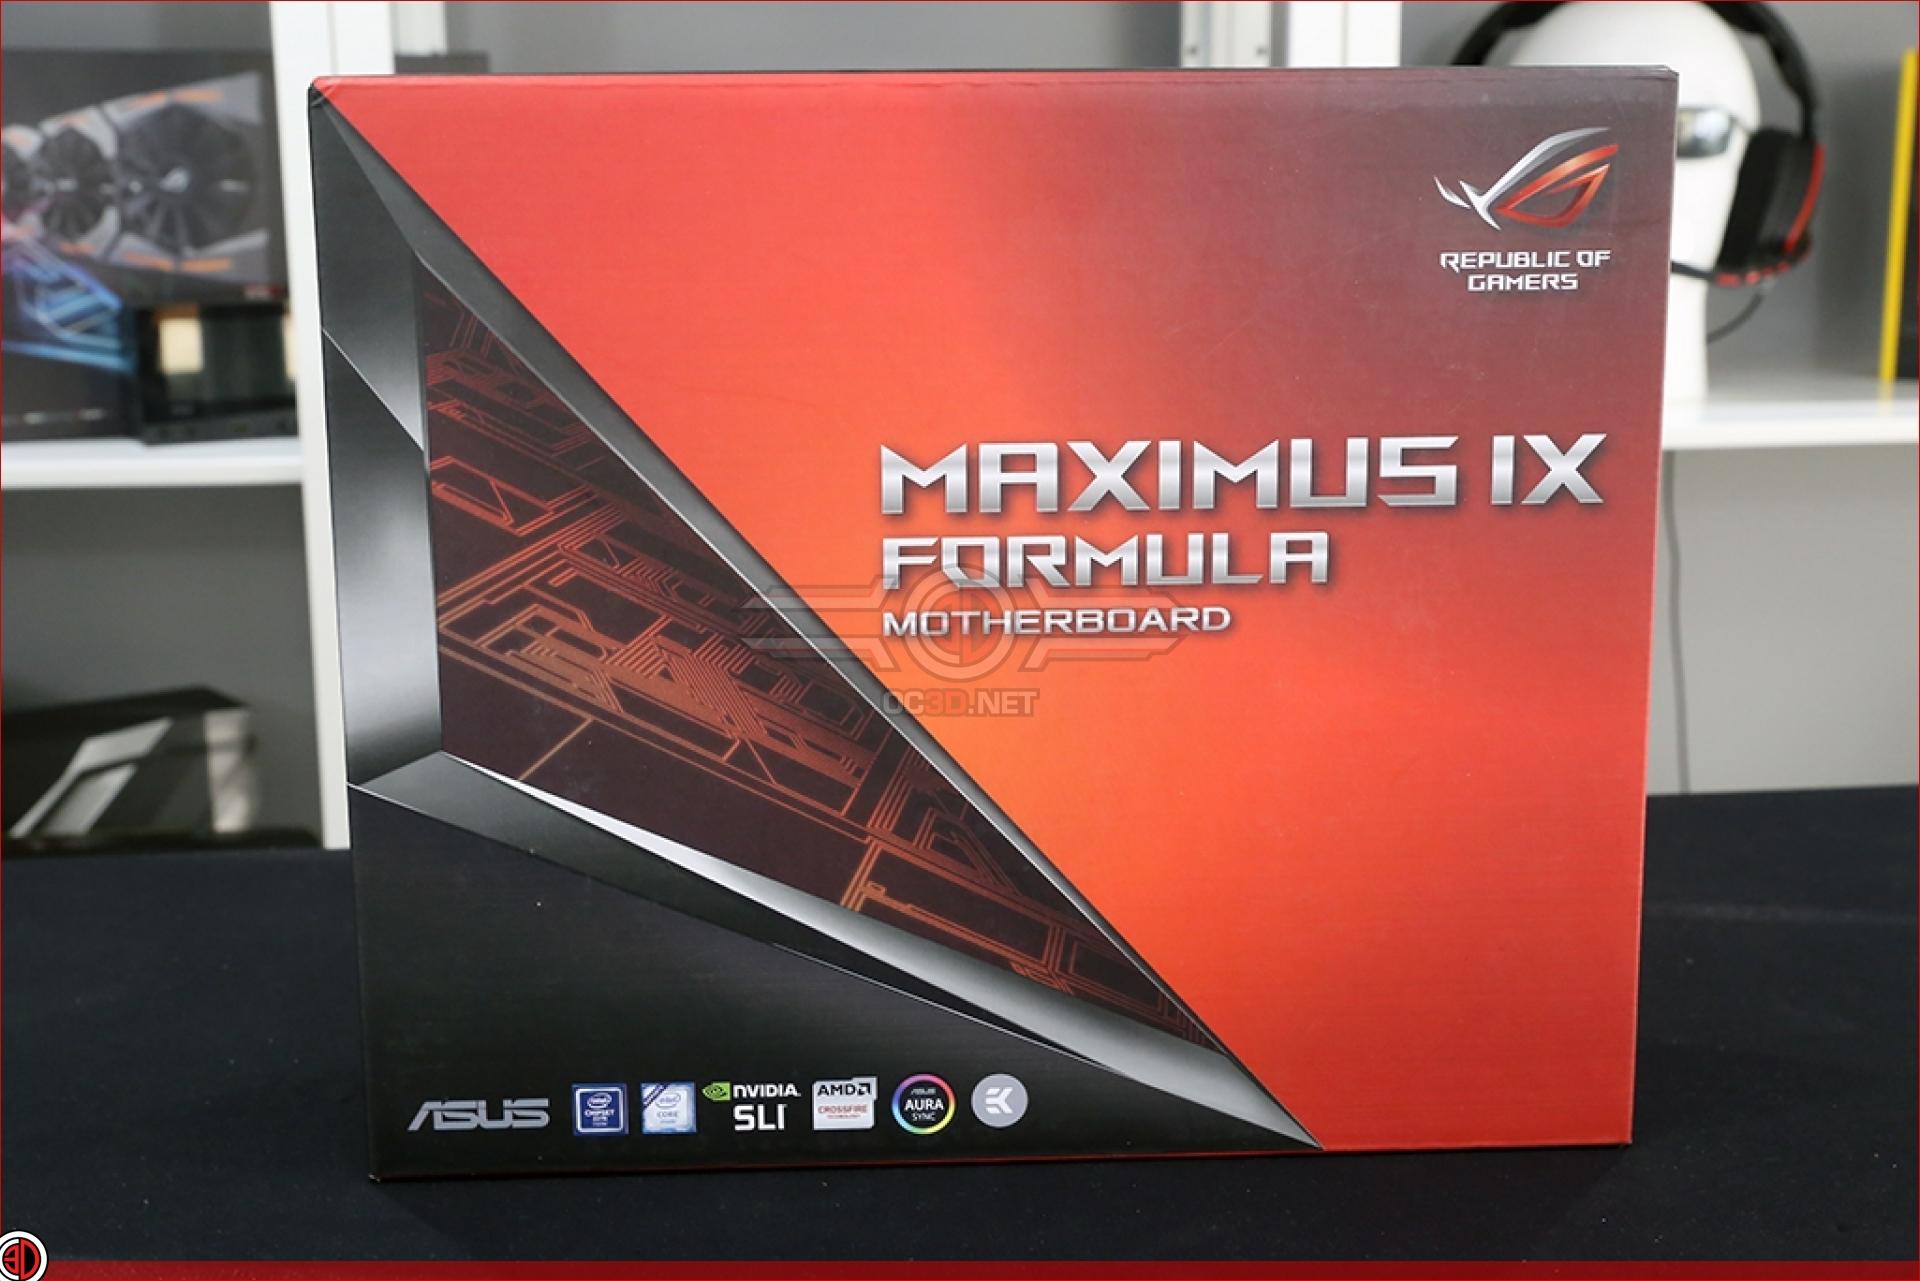 ASUS ROG Z270 Maximus IX Code and Formula Review